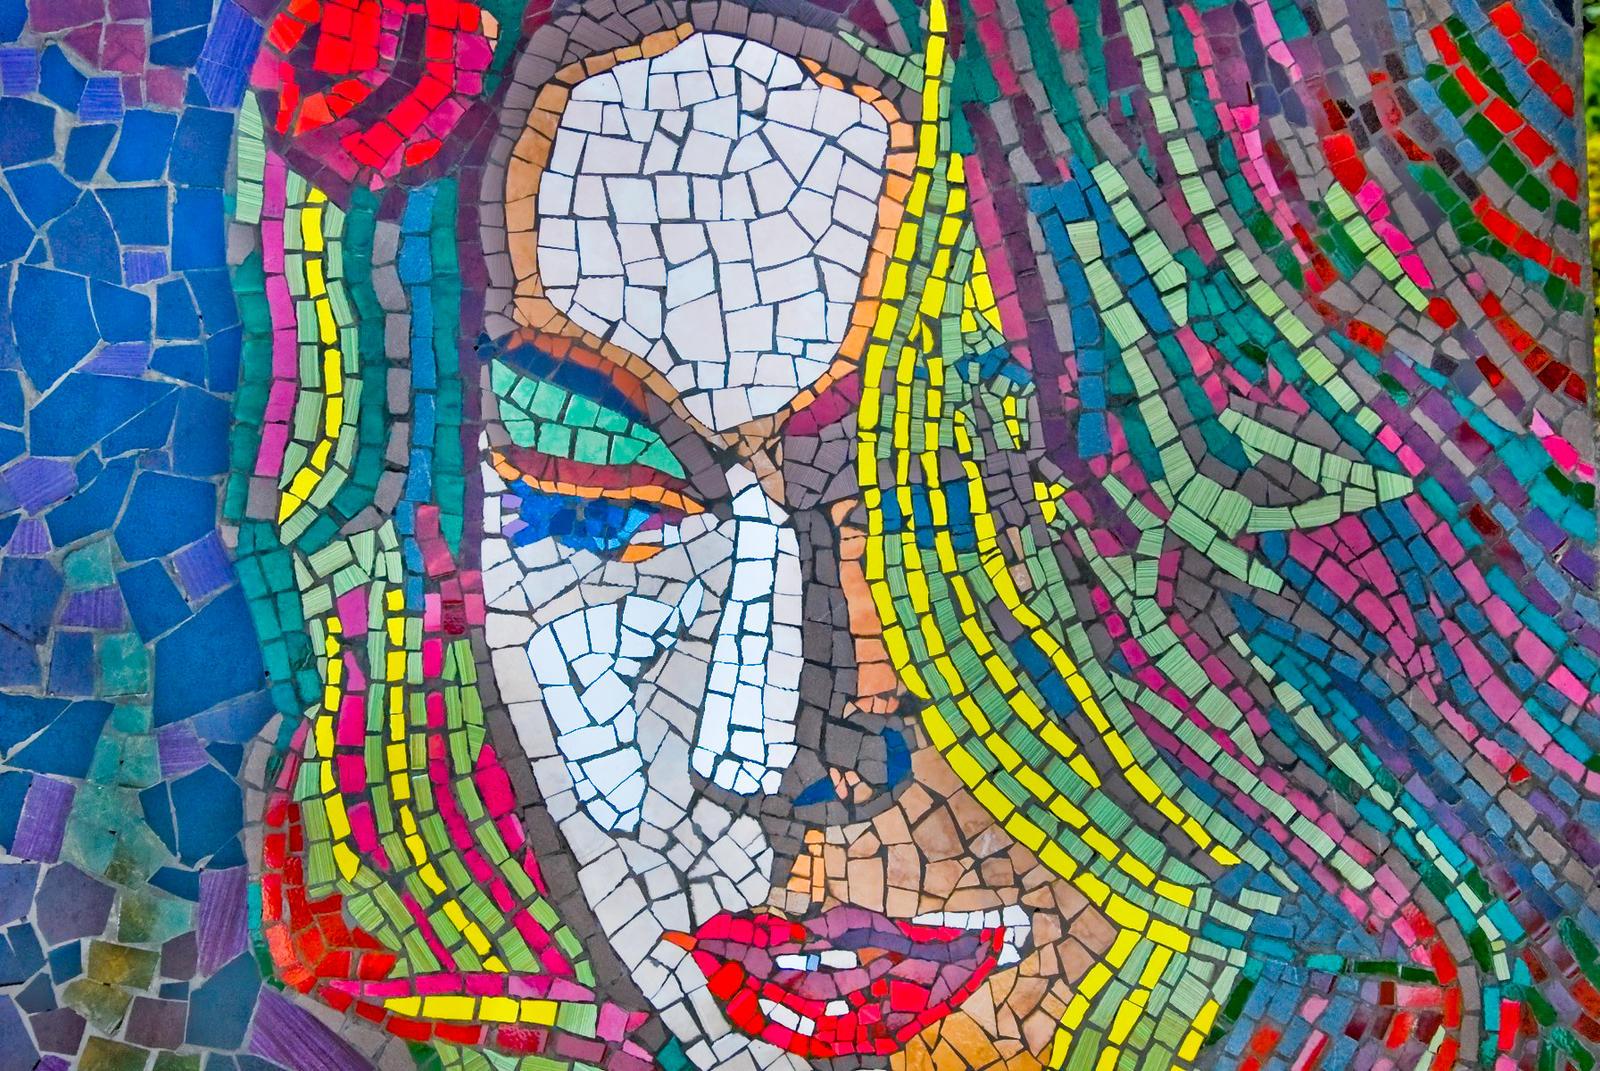 Mosaic girl by lalylaura on DeviantArt